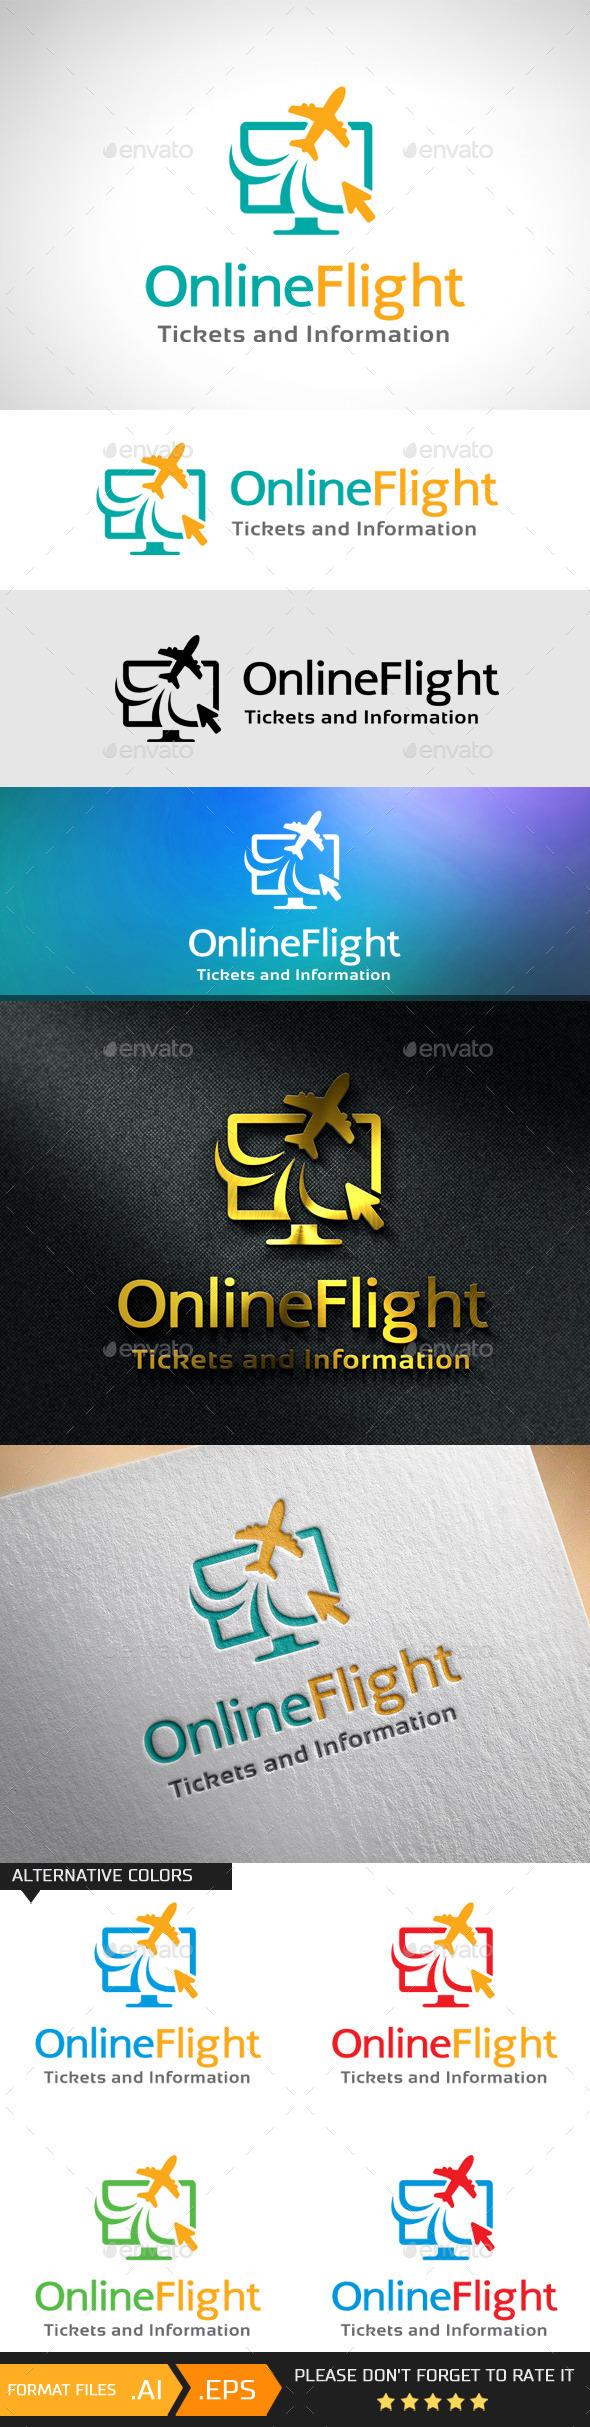 Online Flight Logo Template